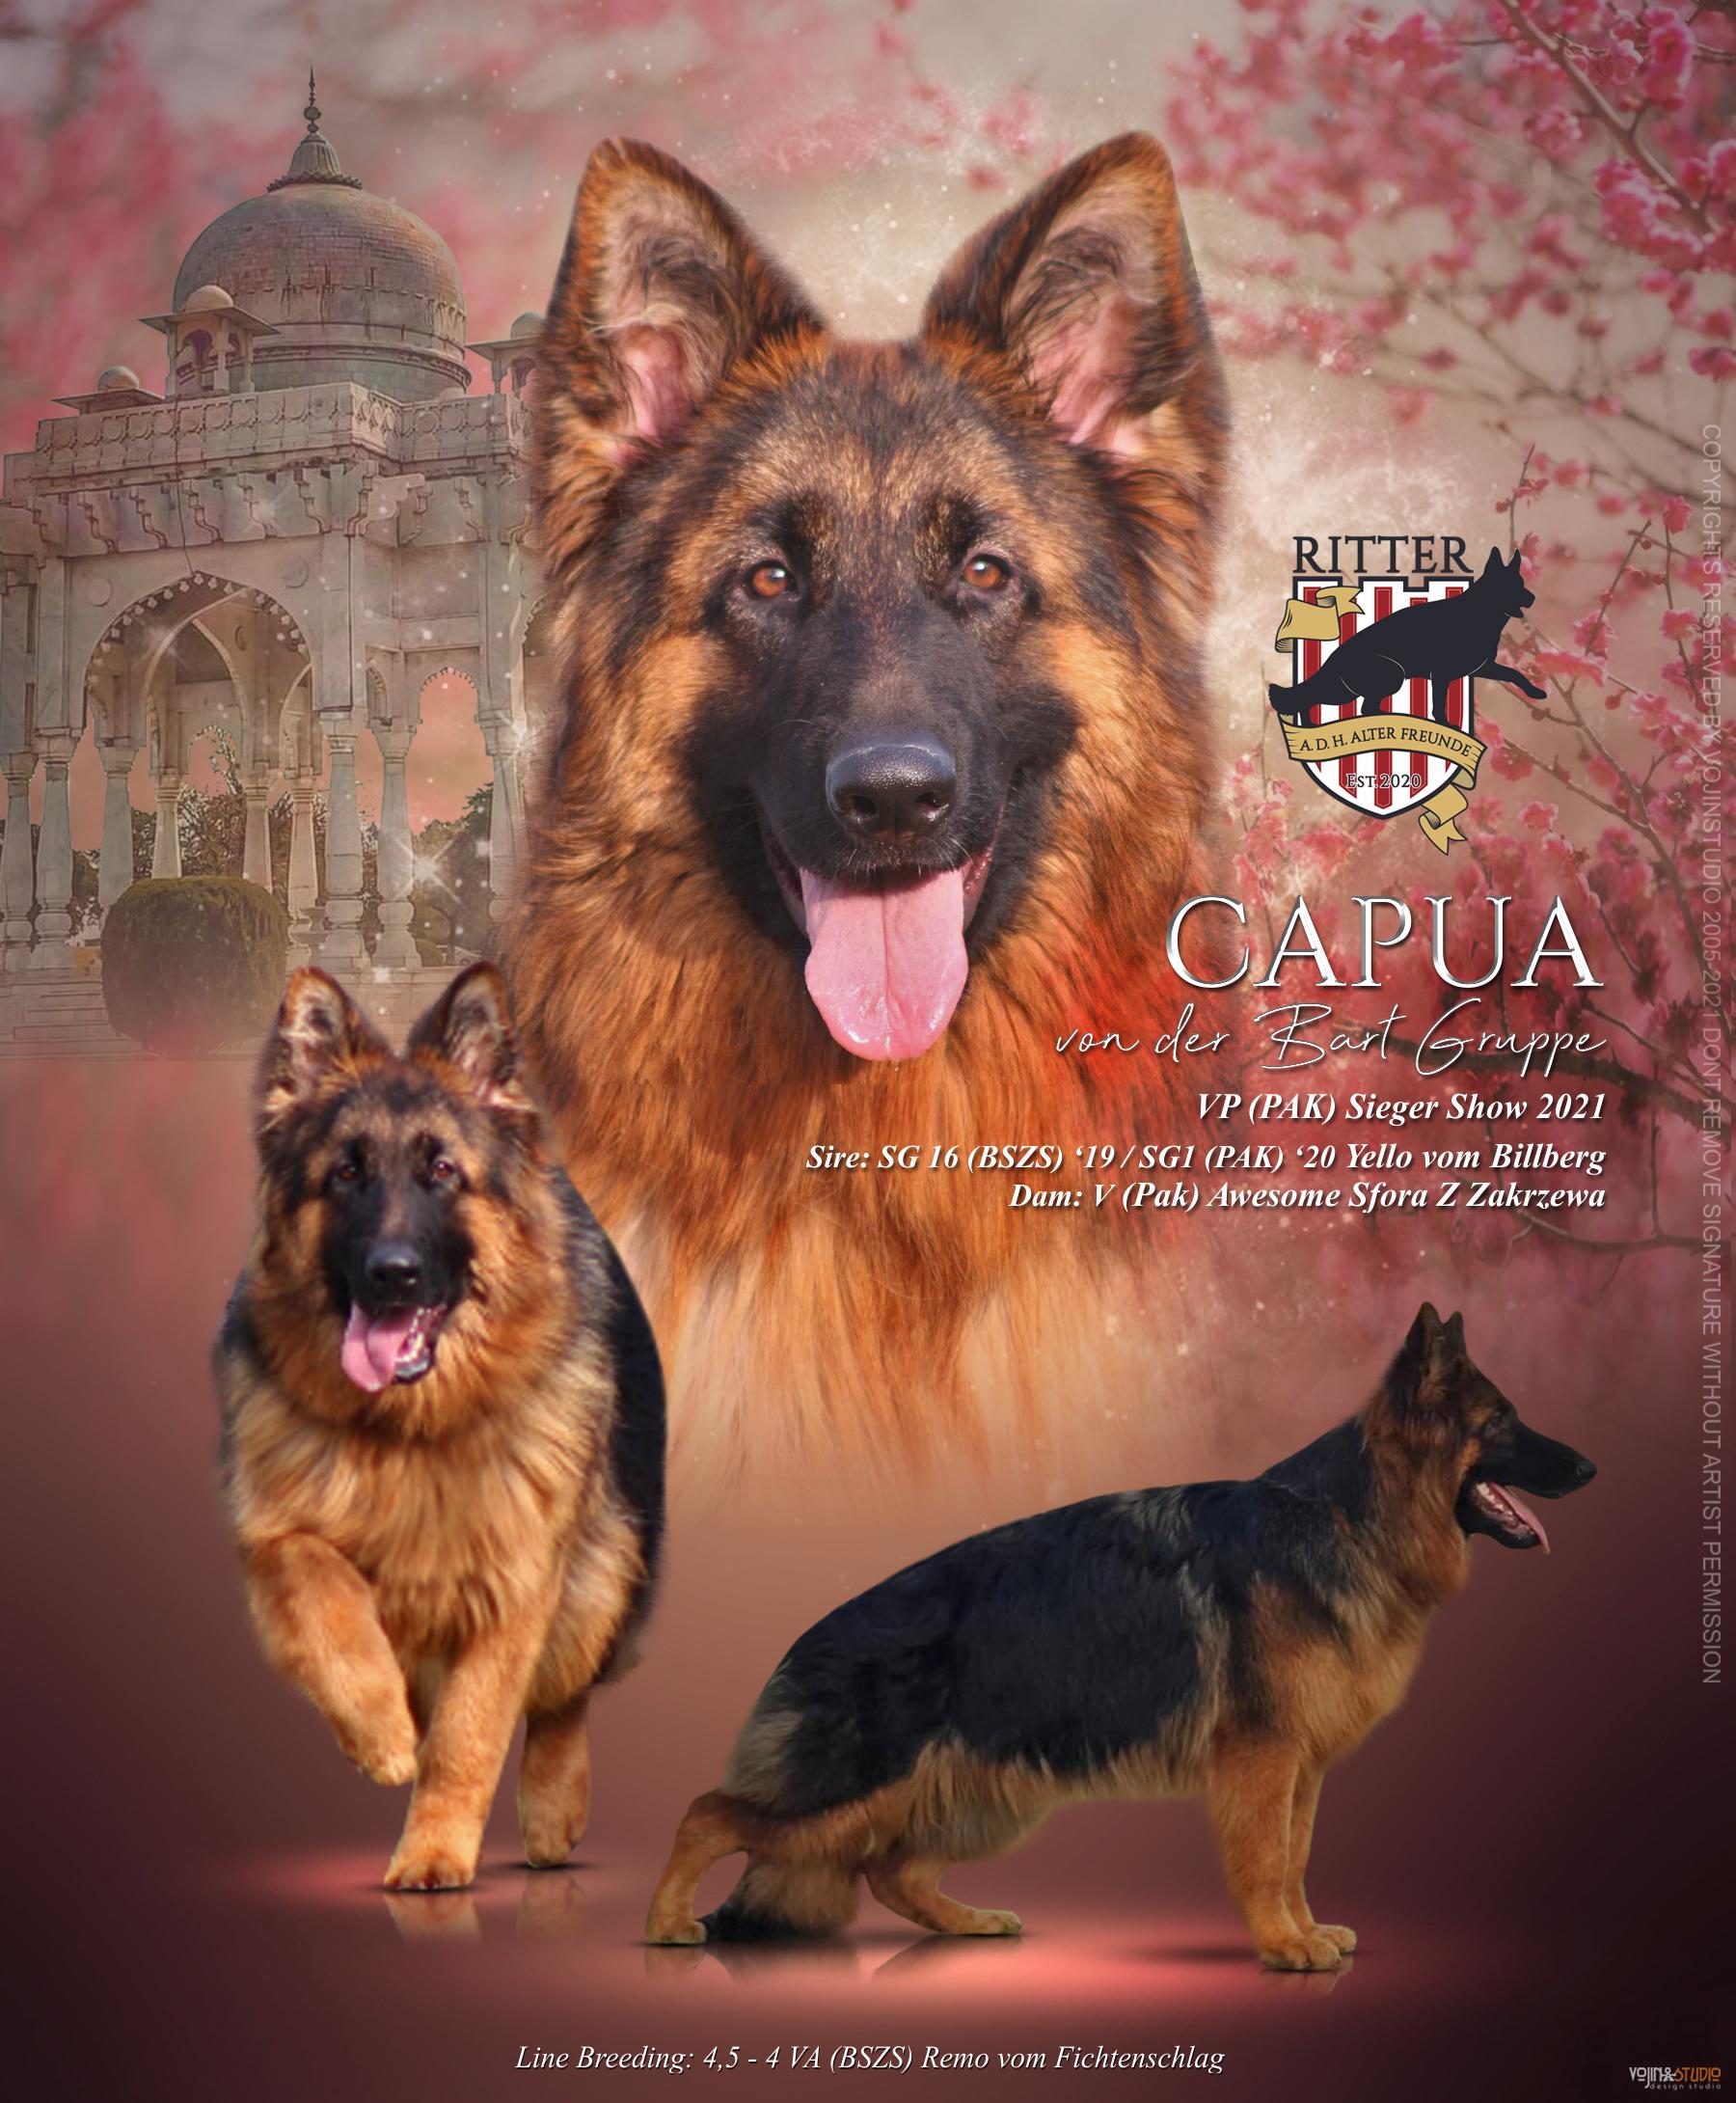 public/dog_images/12771/1618657562.Capua-Poster-8Months.jpg